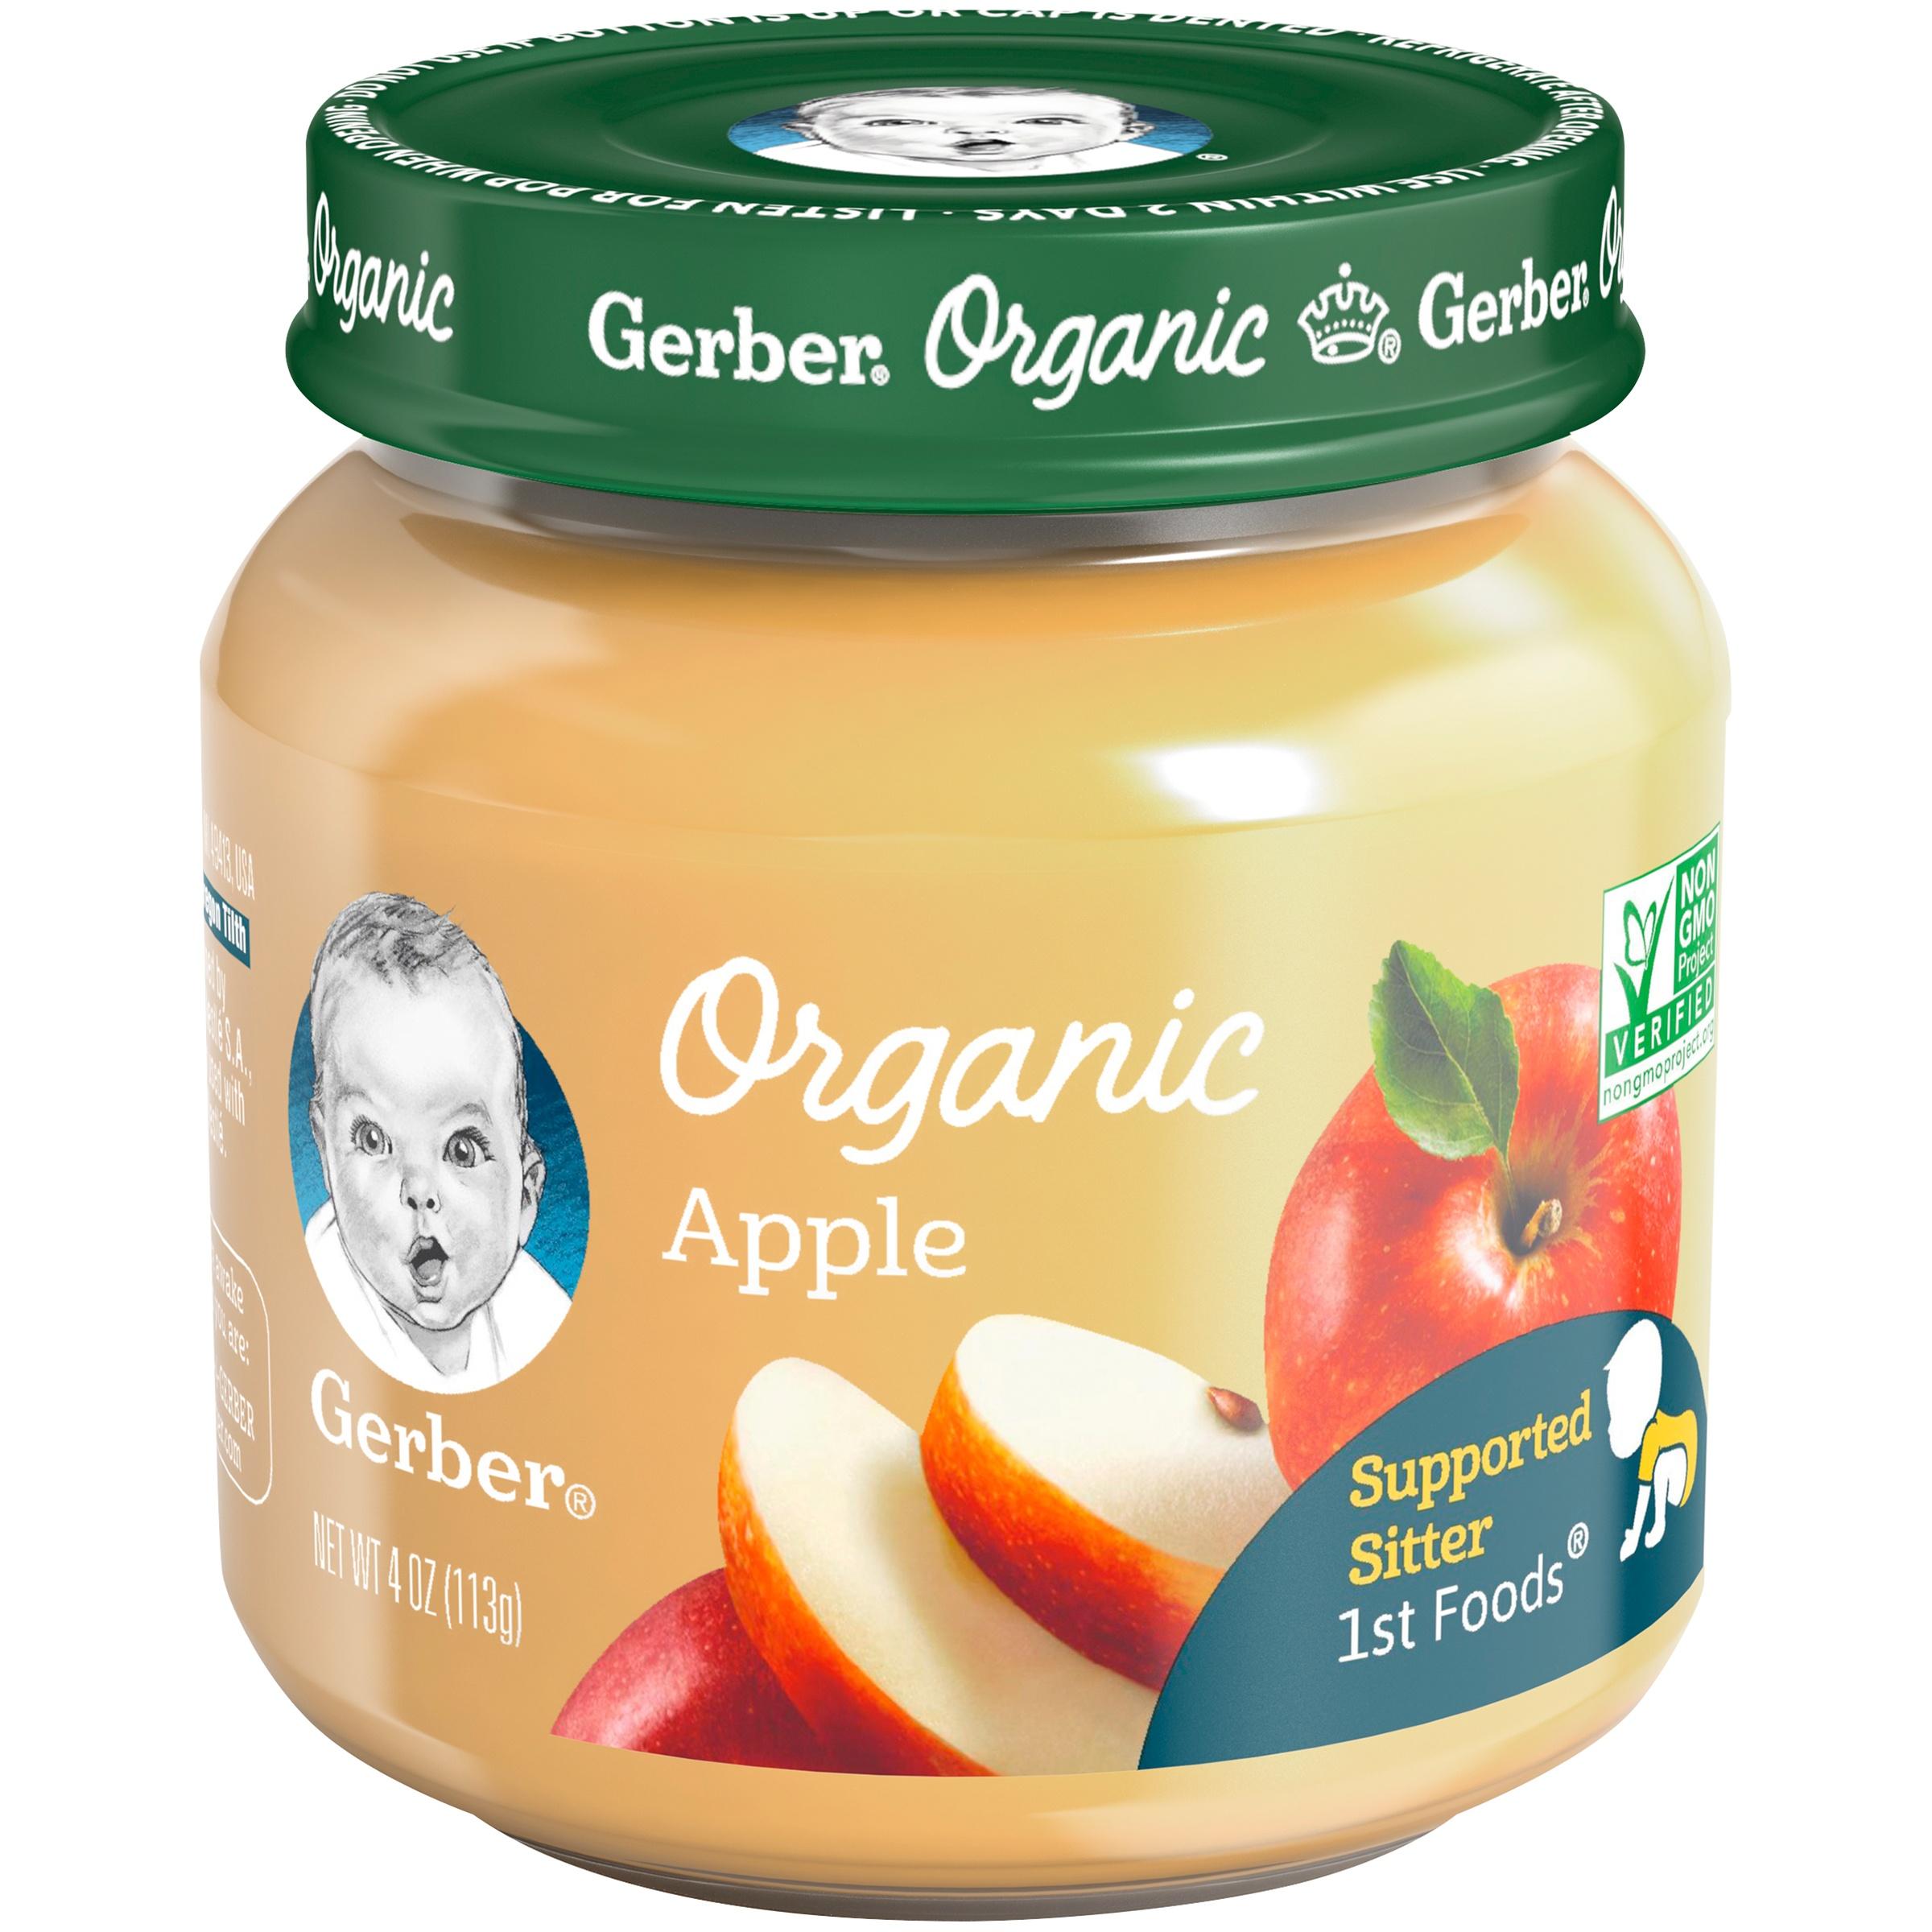 (Pack of 6) Gerber Organic 1st Foods Baby Food, Apple, 4 oz Jars - Walmart.com